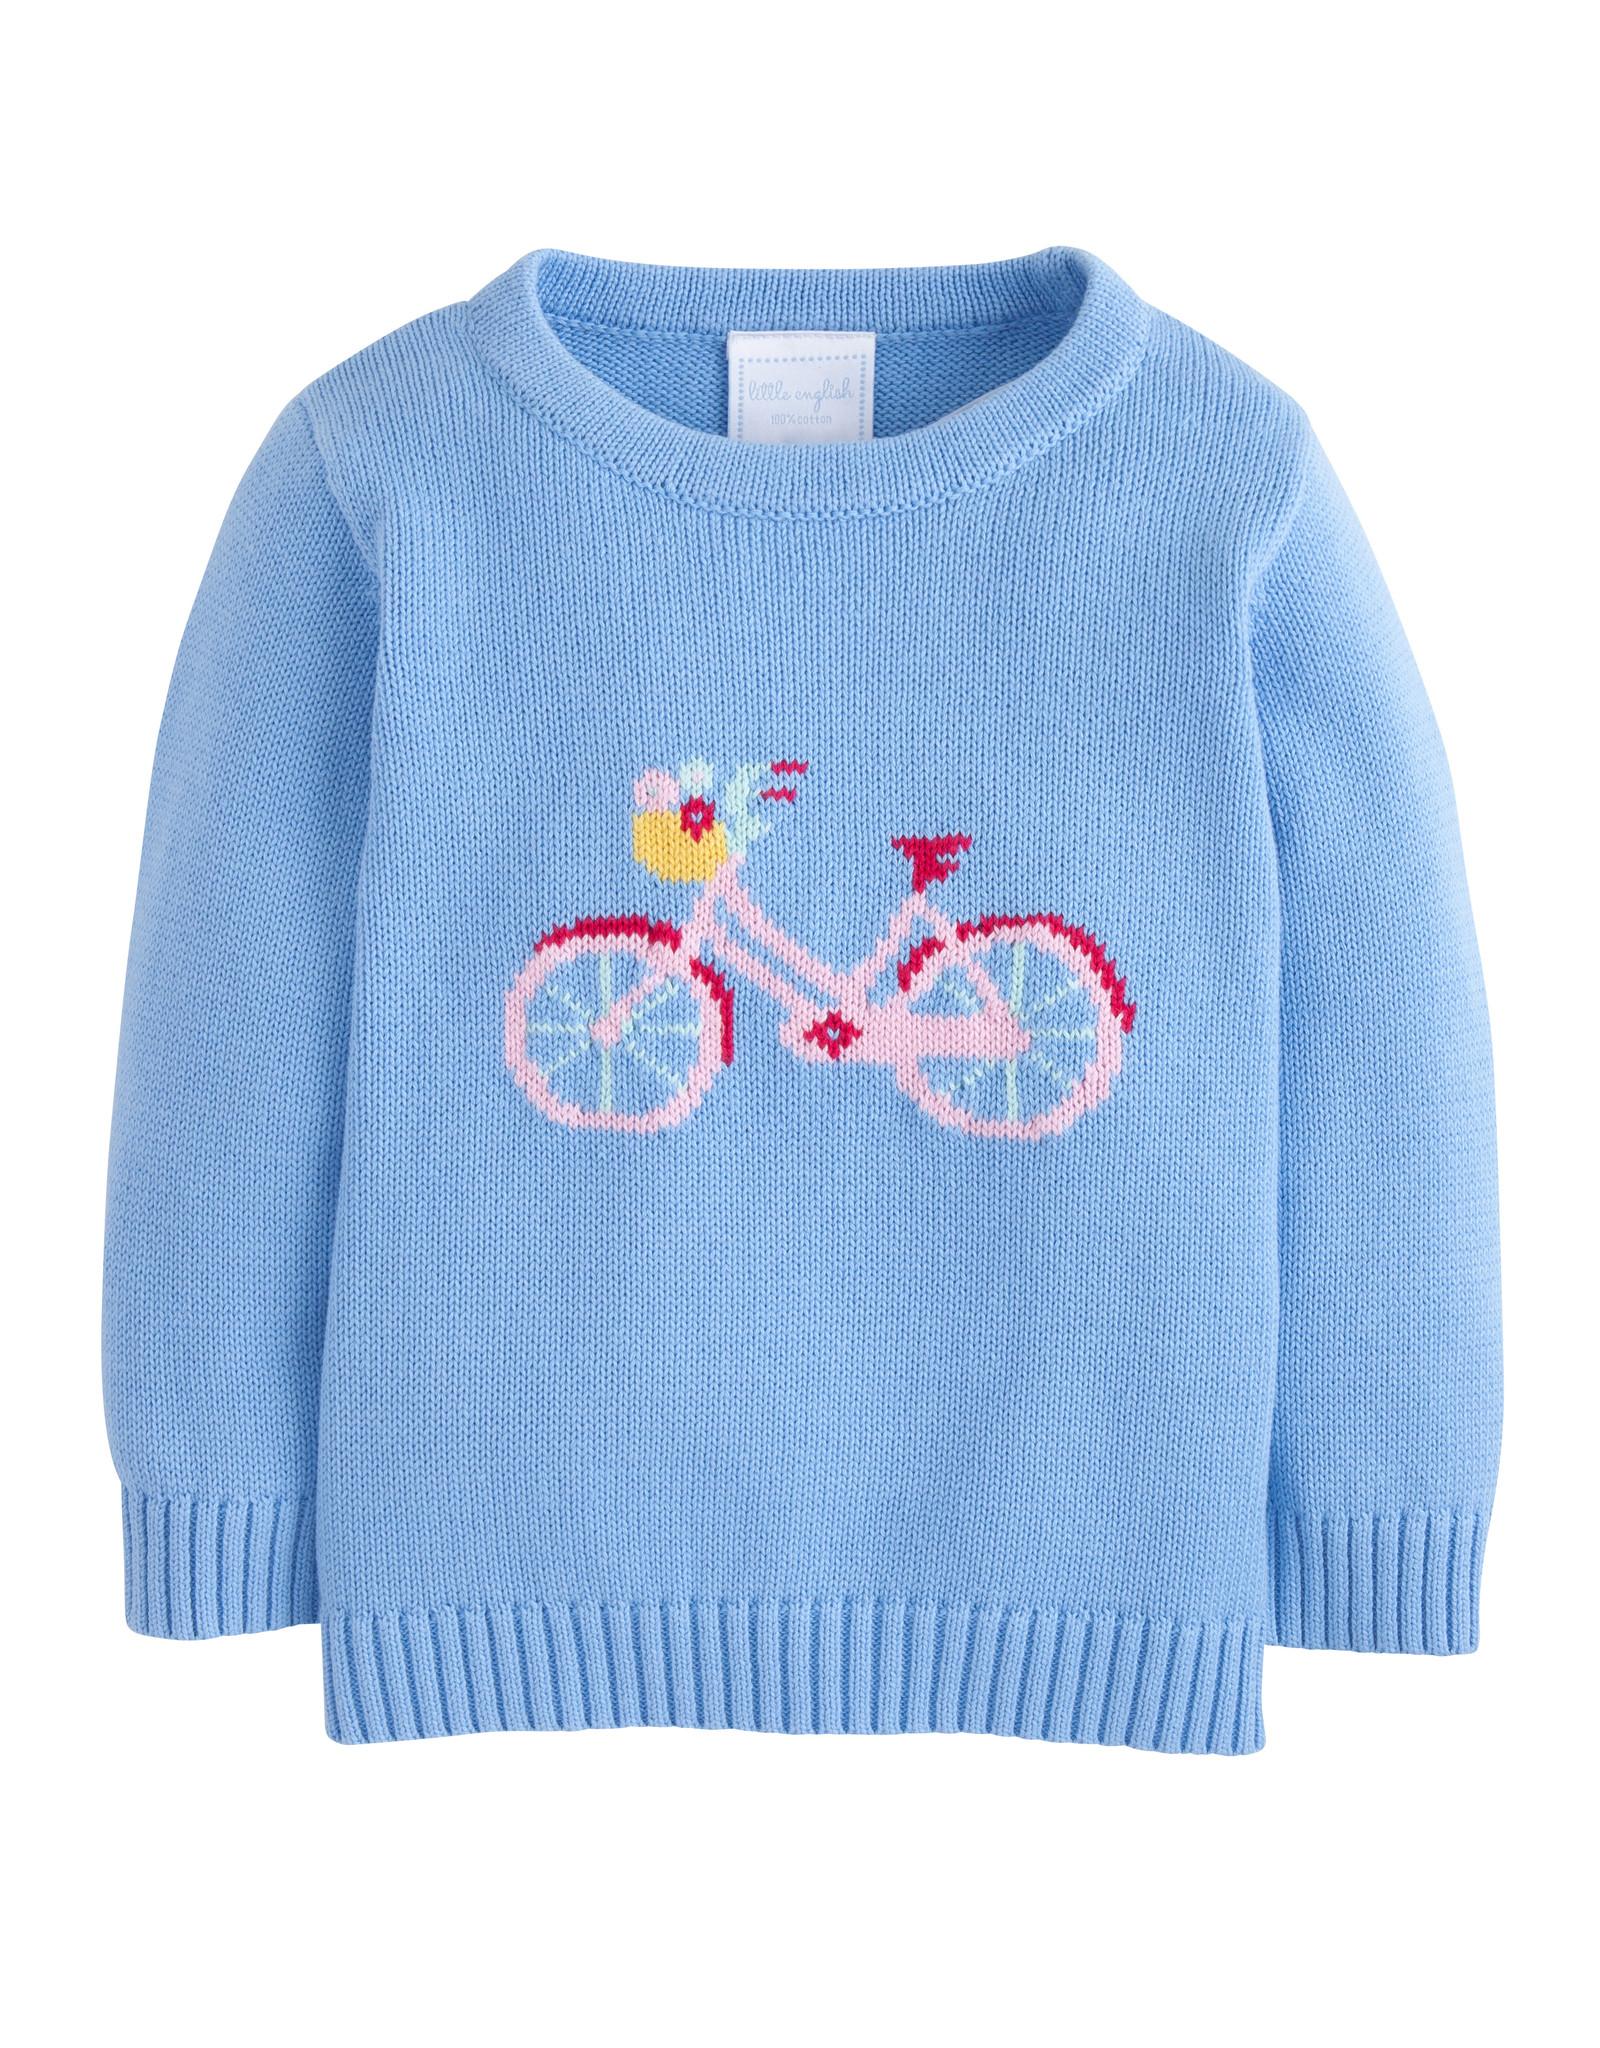 Little English Vintage Bicycle Intarsia Sweater